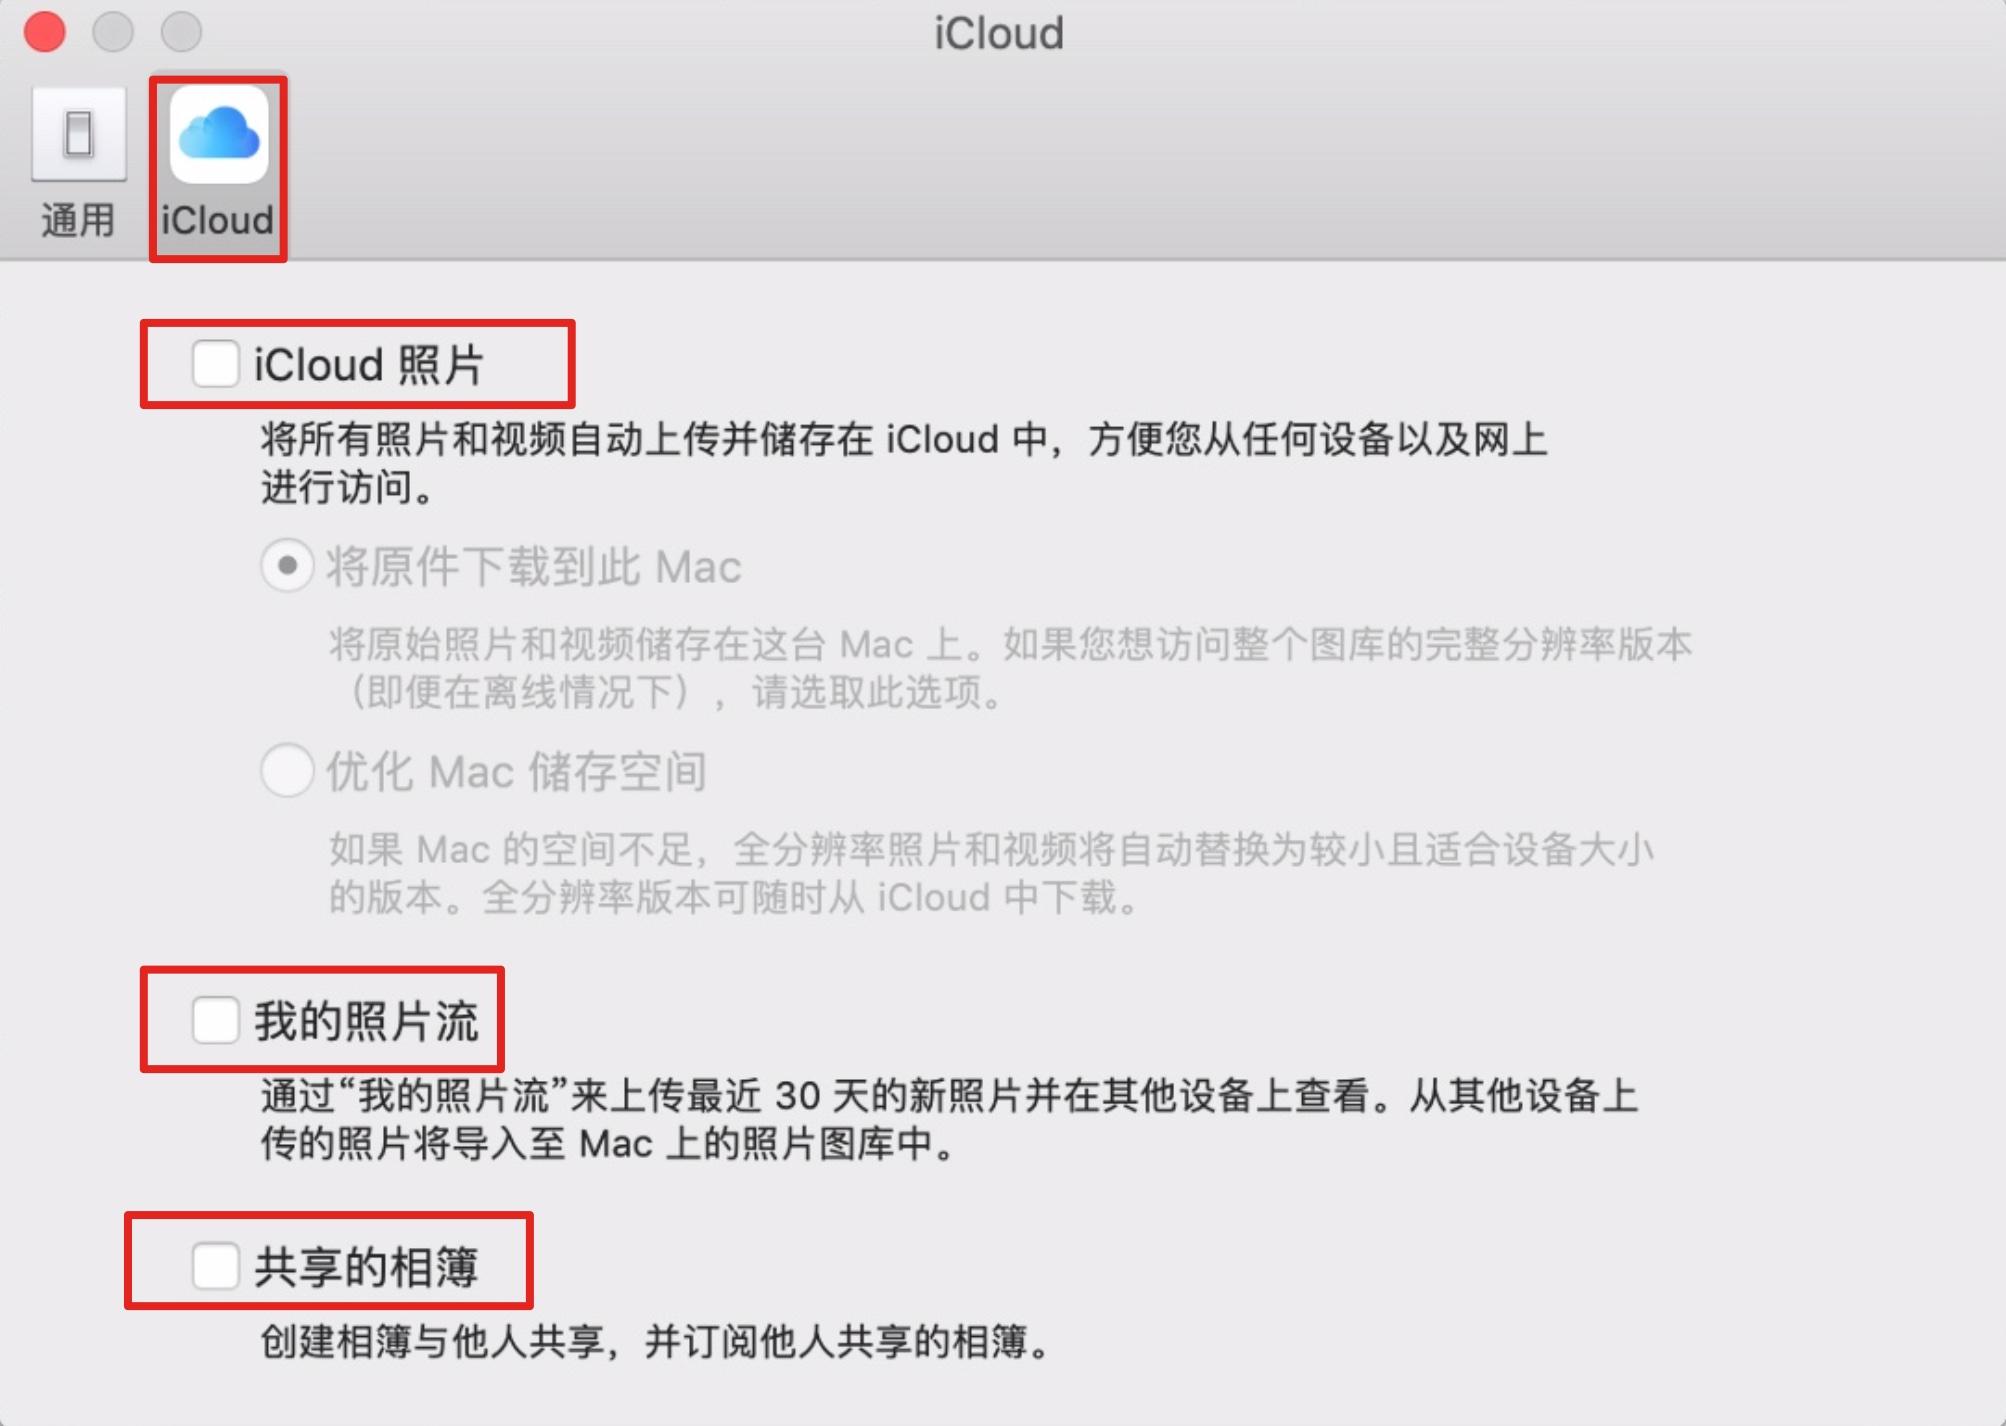 Xnip2019-03-18_18-11-27.jpg